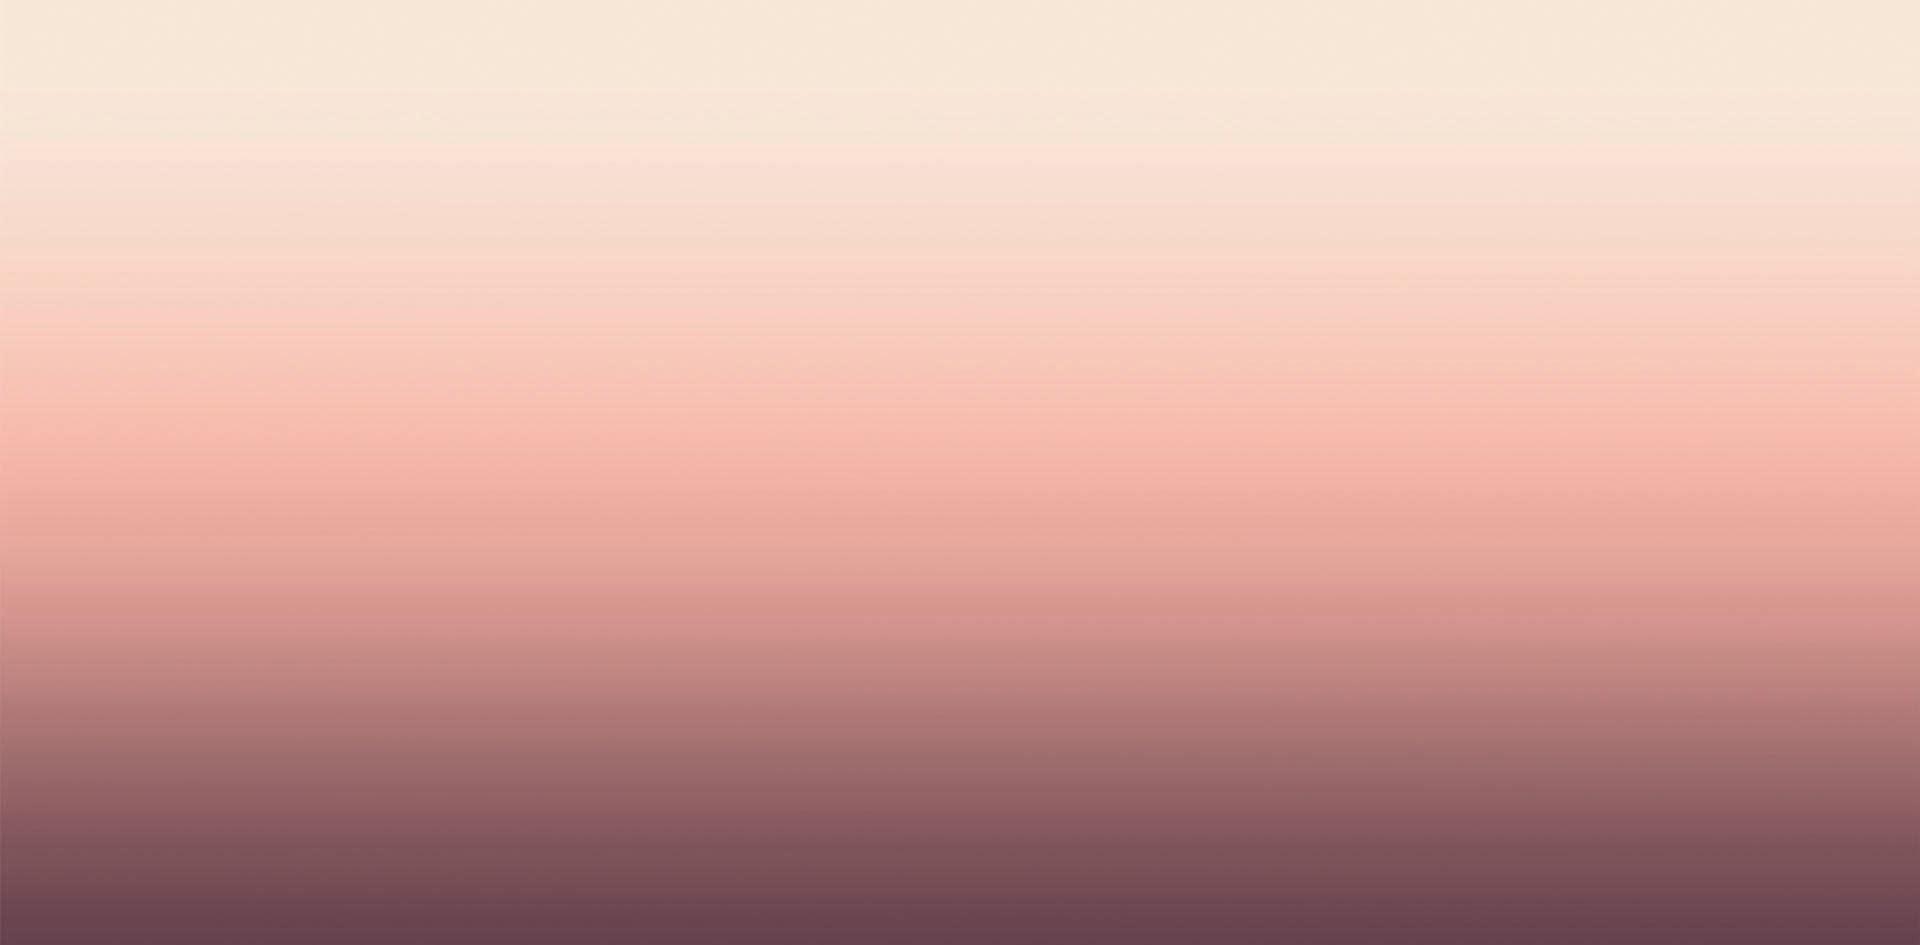 Fototapete Sunset - Ombre 336/260 cm Wohnen/Wohntextilien/Tapeten/Fototapeten/Fototapeten Strand